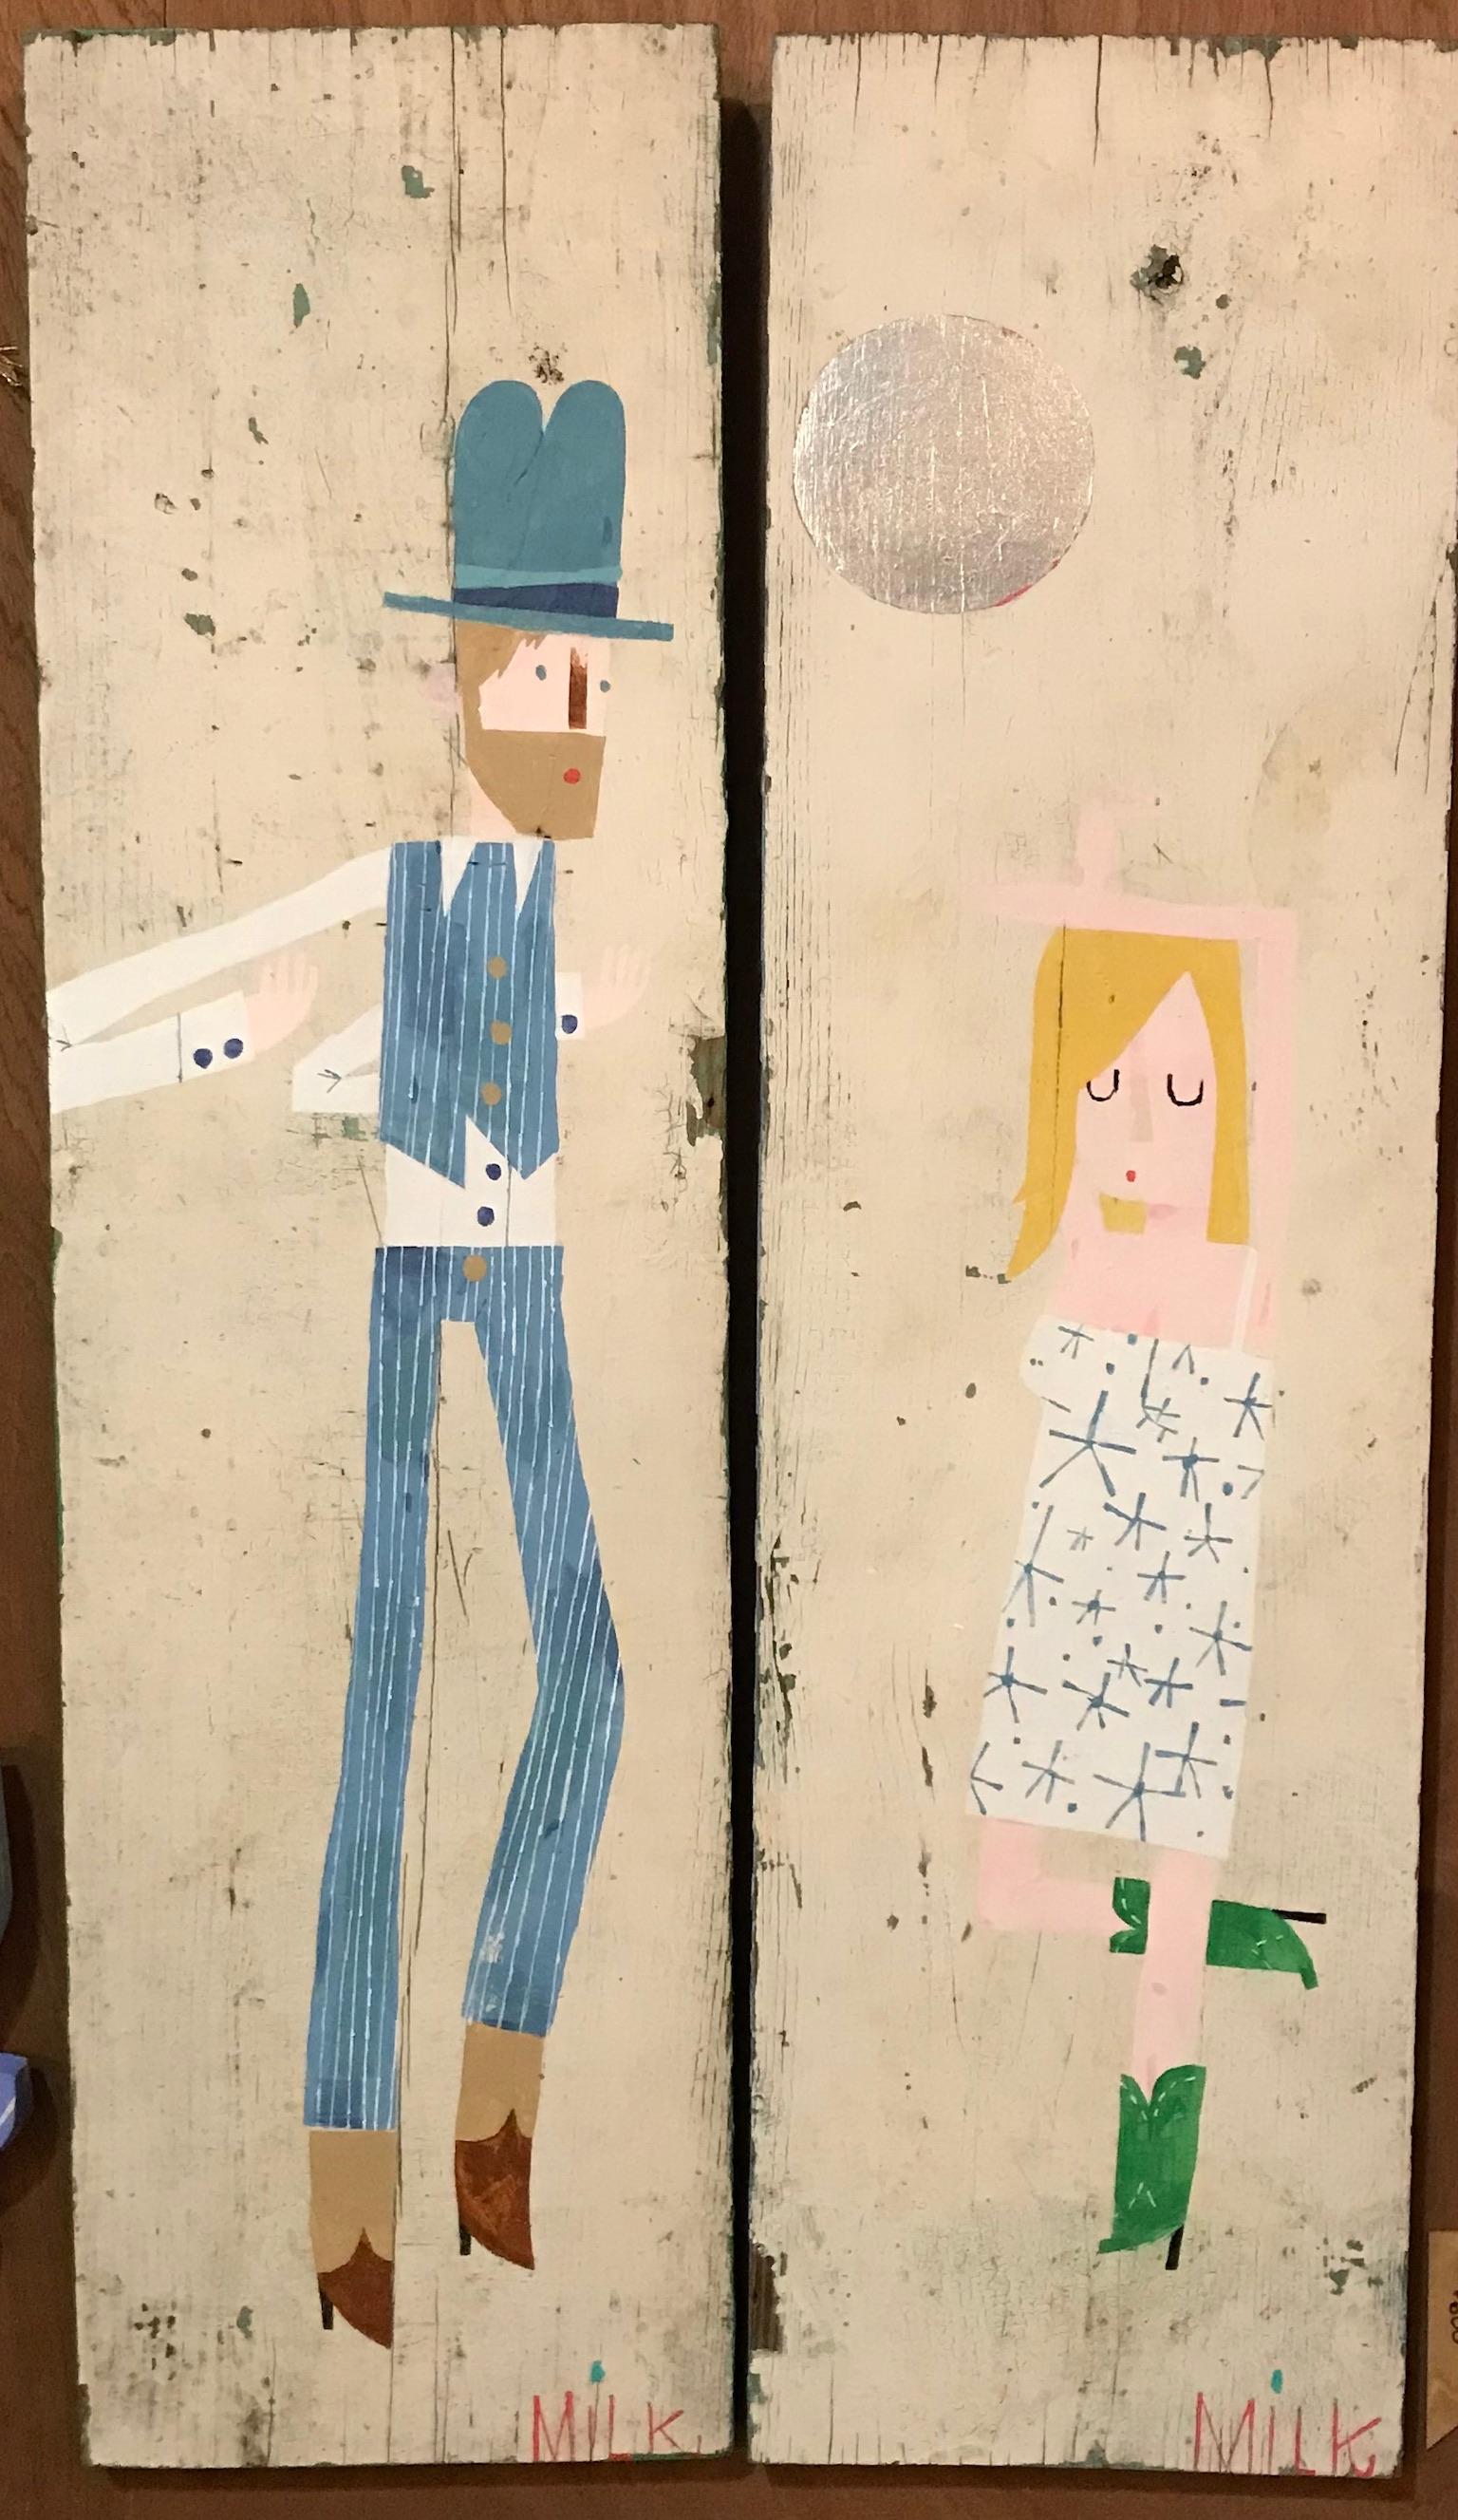 Disco, acrylic on found wood, each panel 11x27